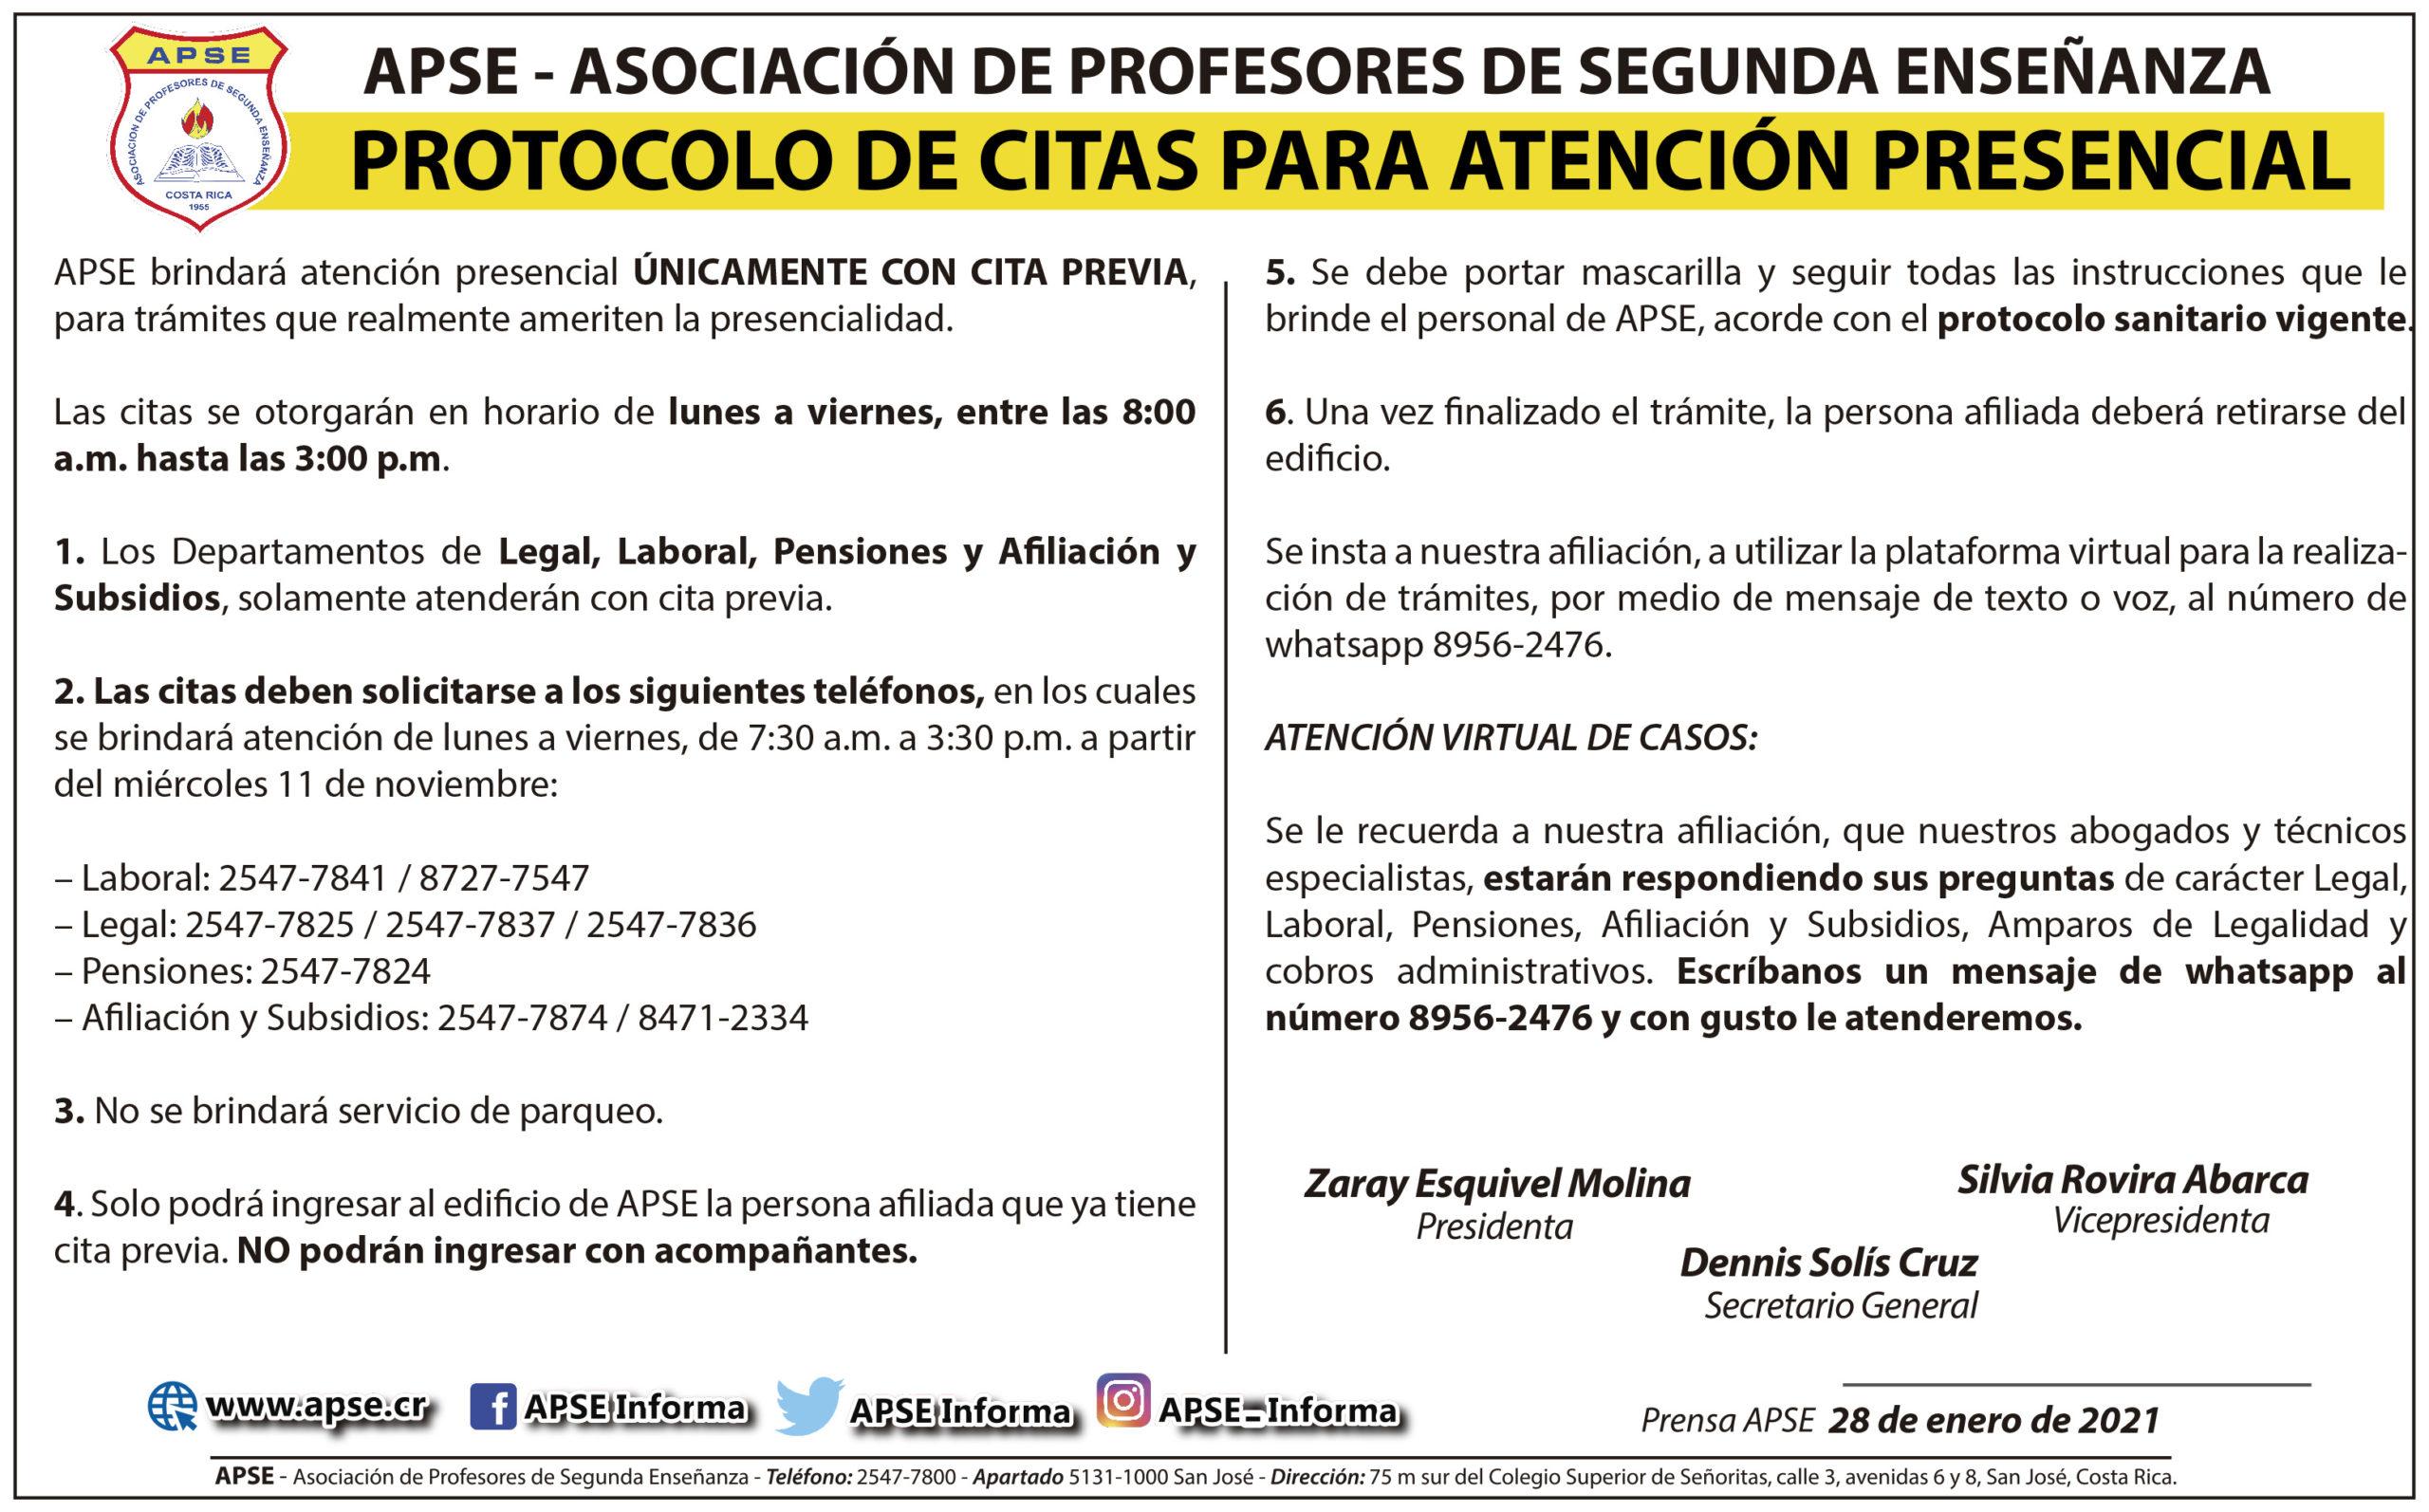 PROTOCOLO DE CITAS PARA ATENCIÓN PRESENCIAL